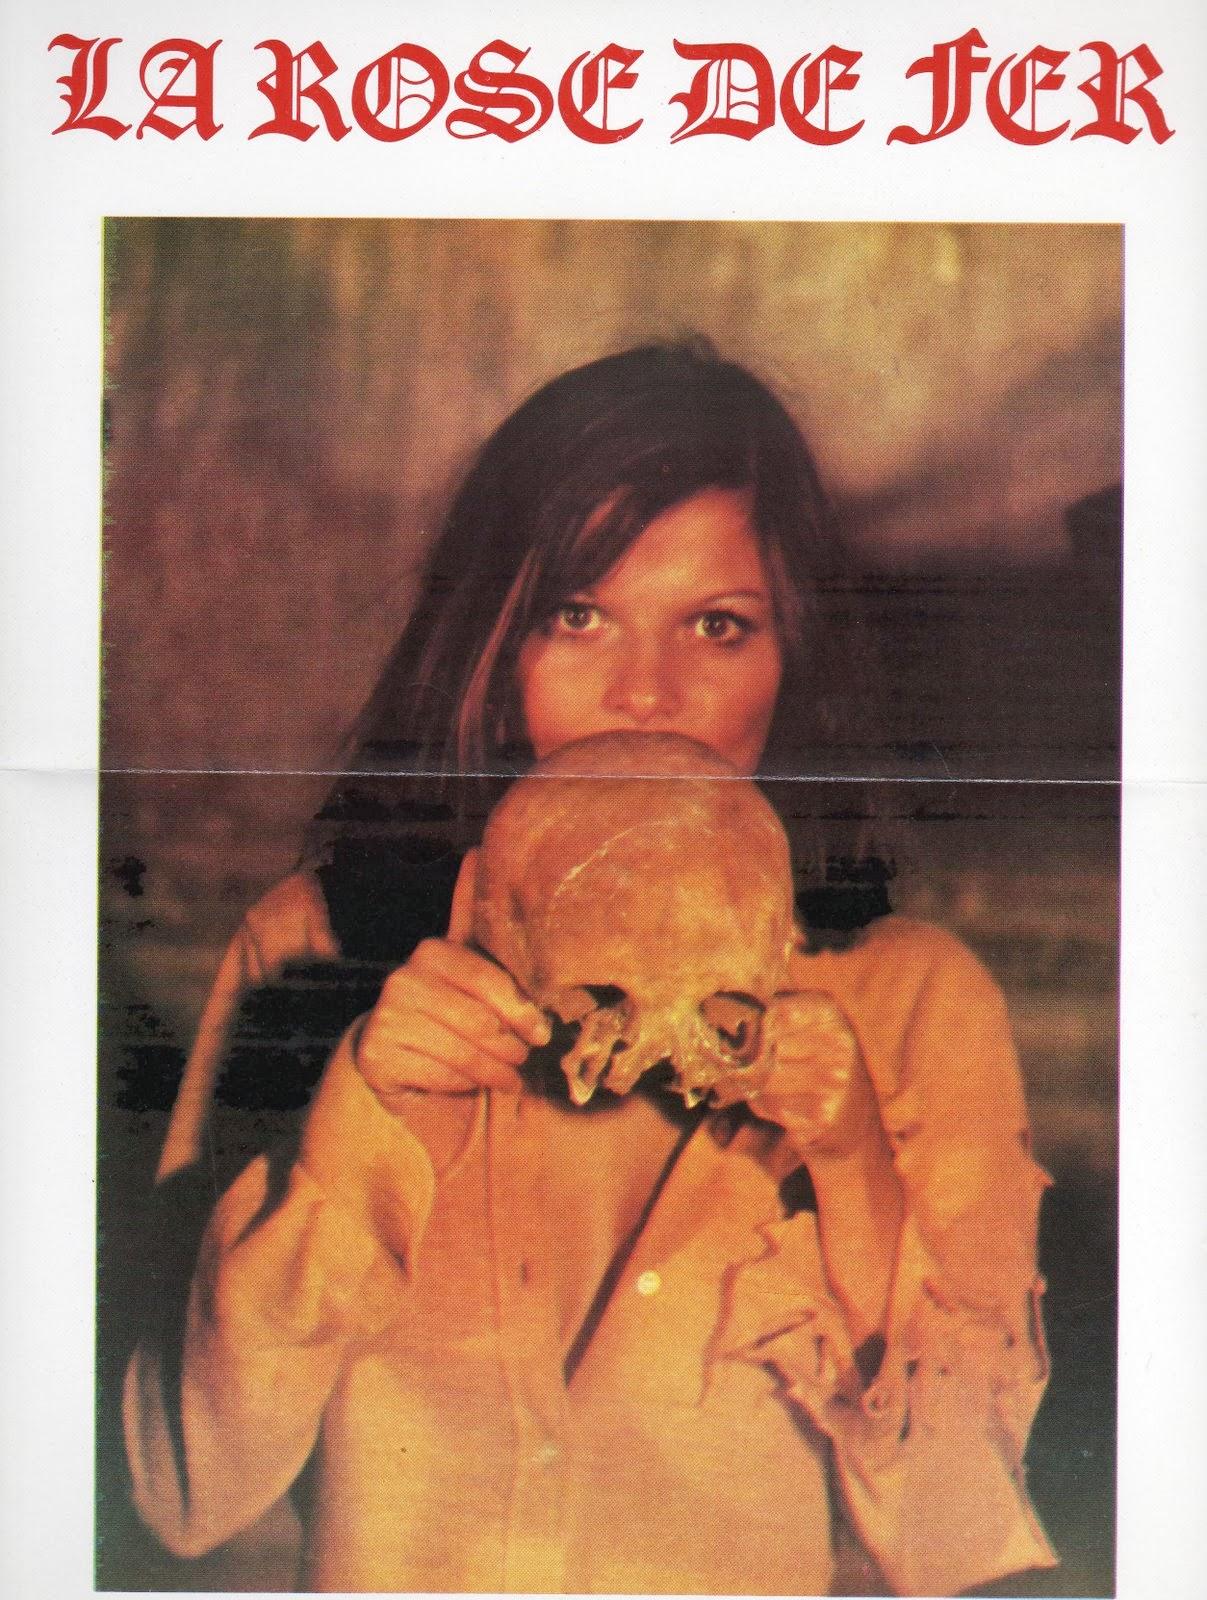 The Iron Rose 1973 French Moyenne Poster - Posteritati